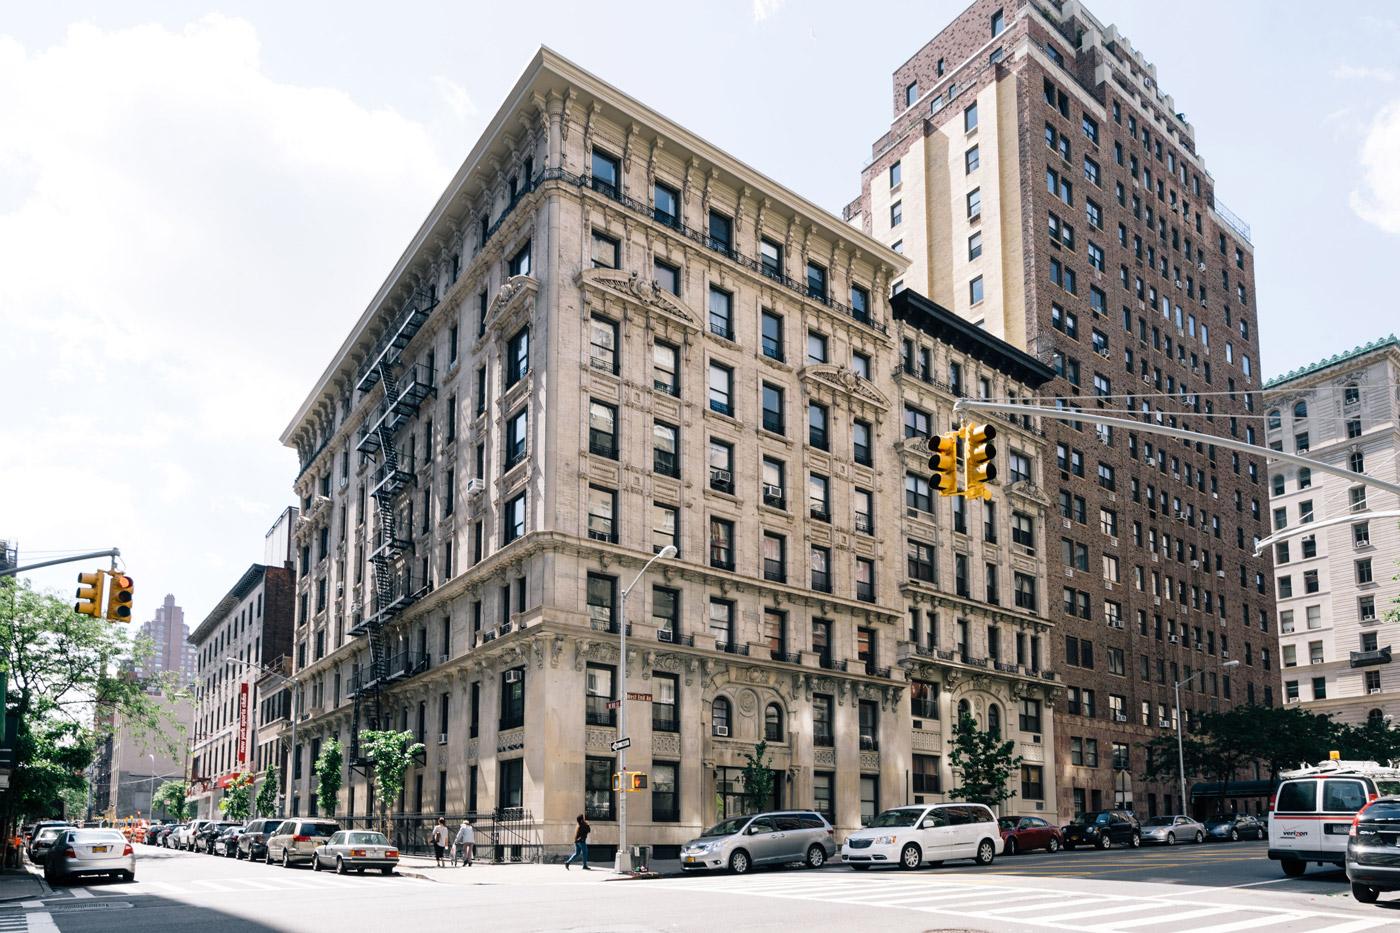 co-op boards in new york city